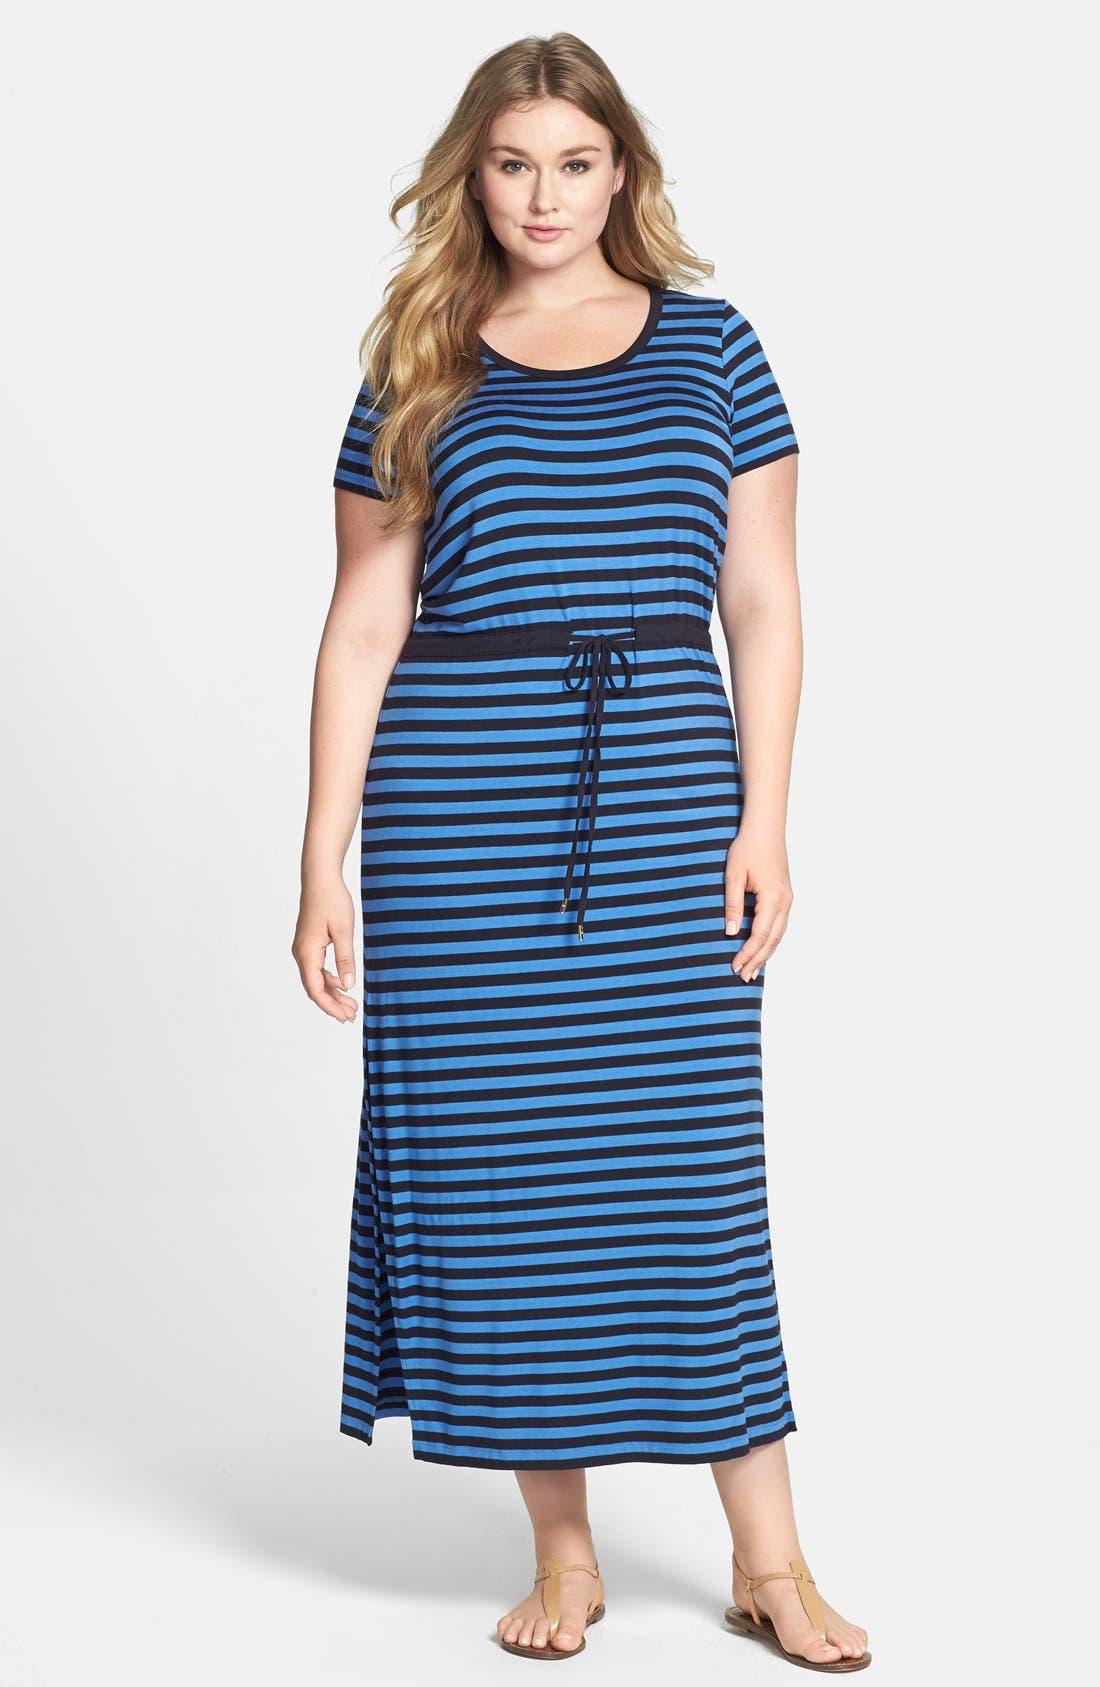 Alternate Image 1 Selected - MICHAEL Michael Kors Stripe Drawstring Waist Stretch Knit Maxi Dress (Plus Size)